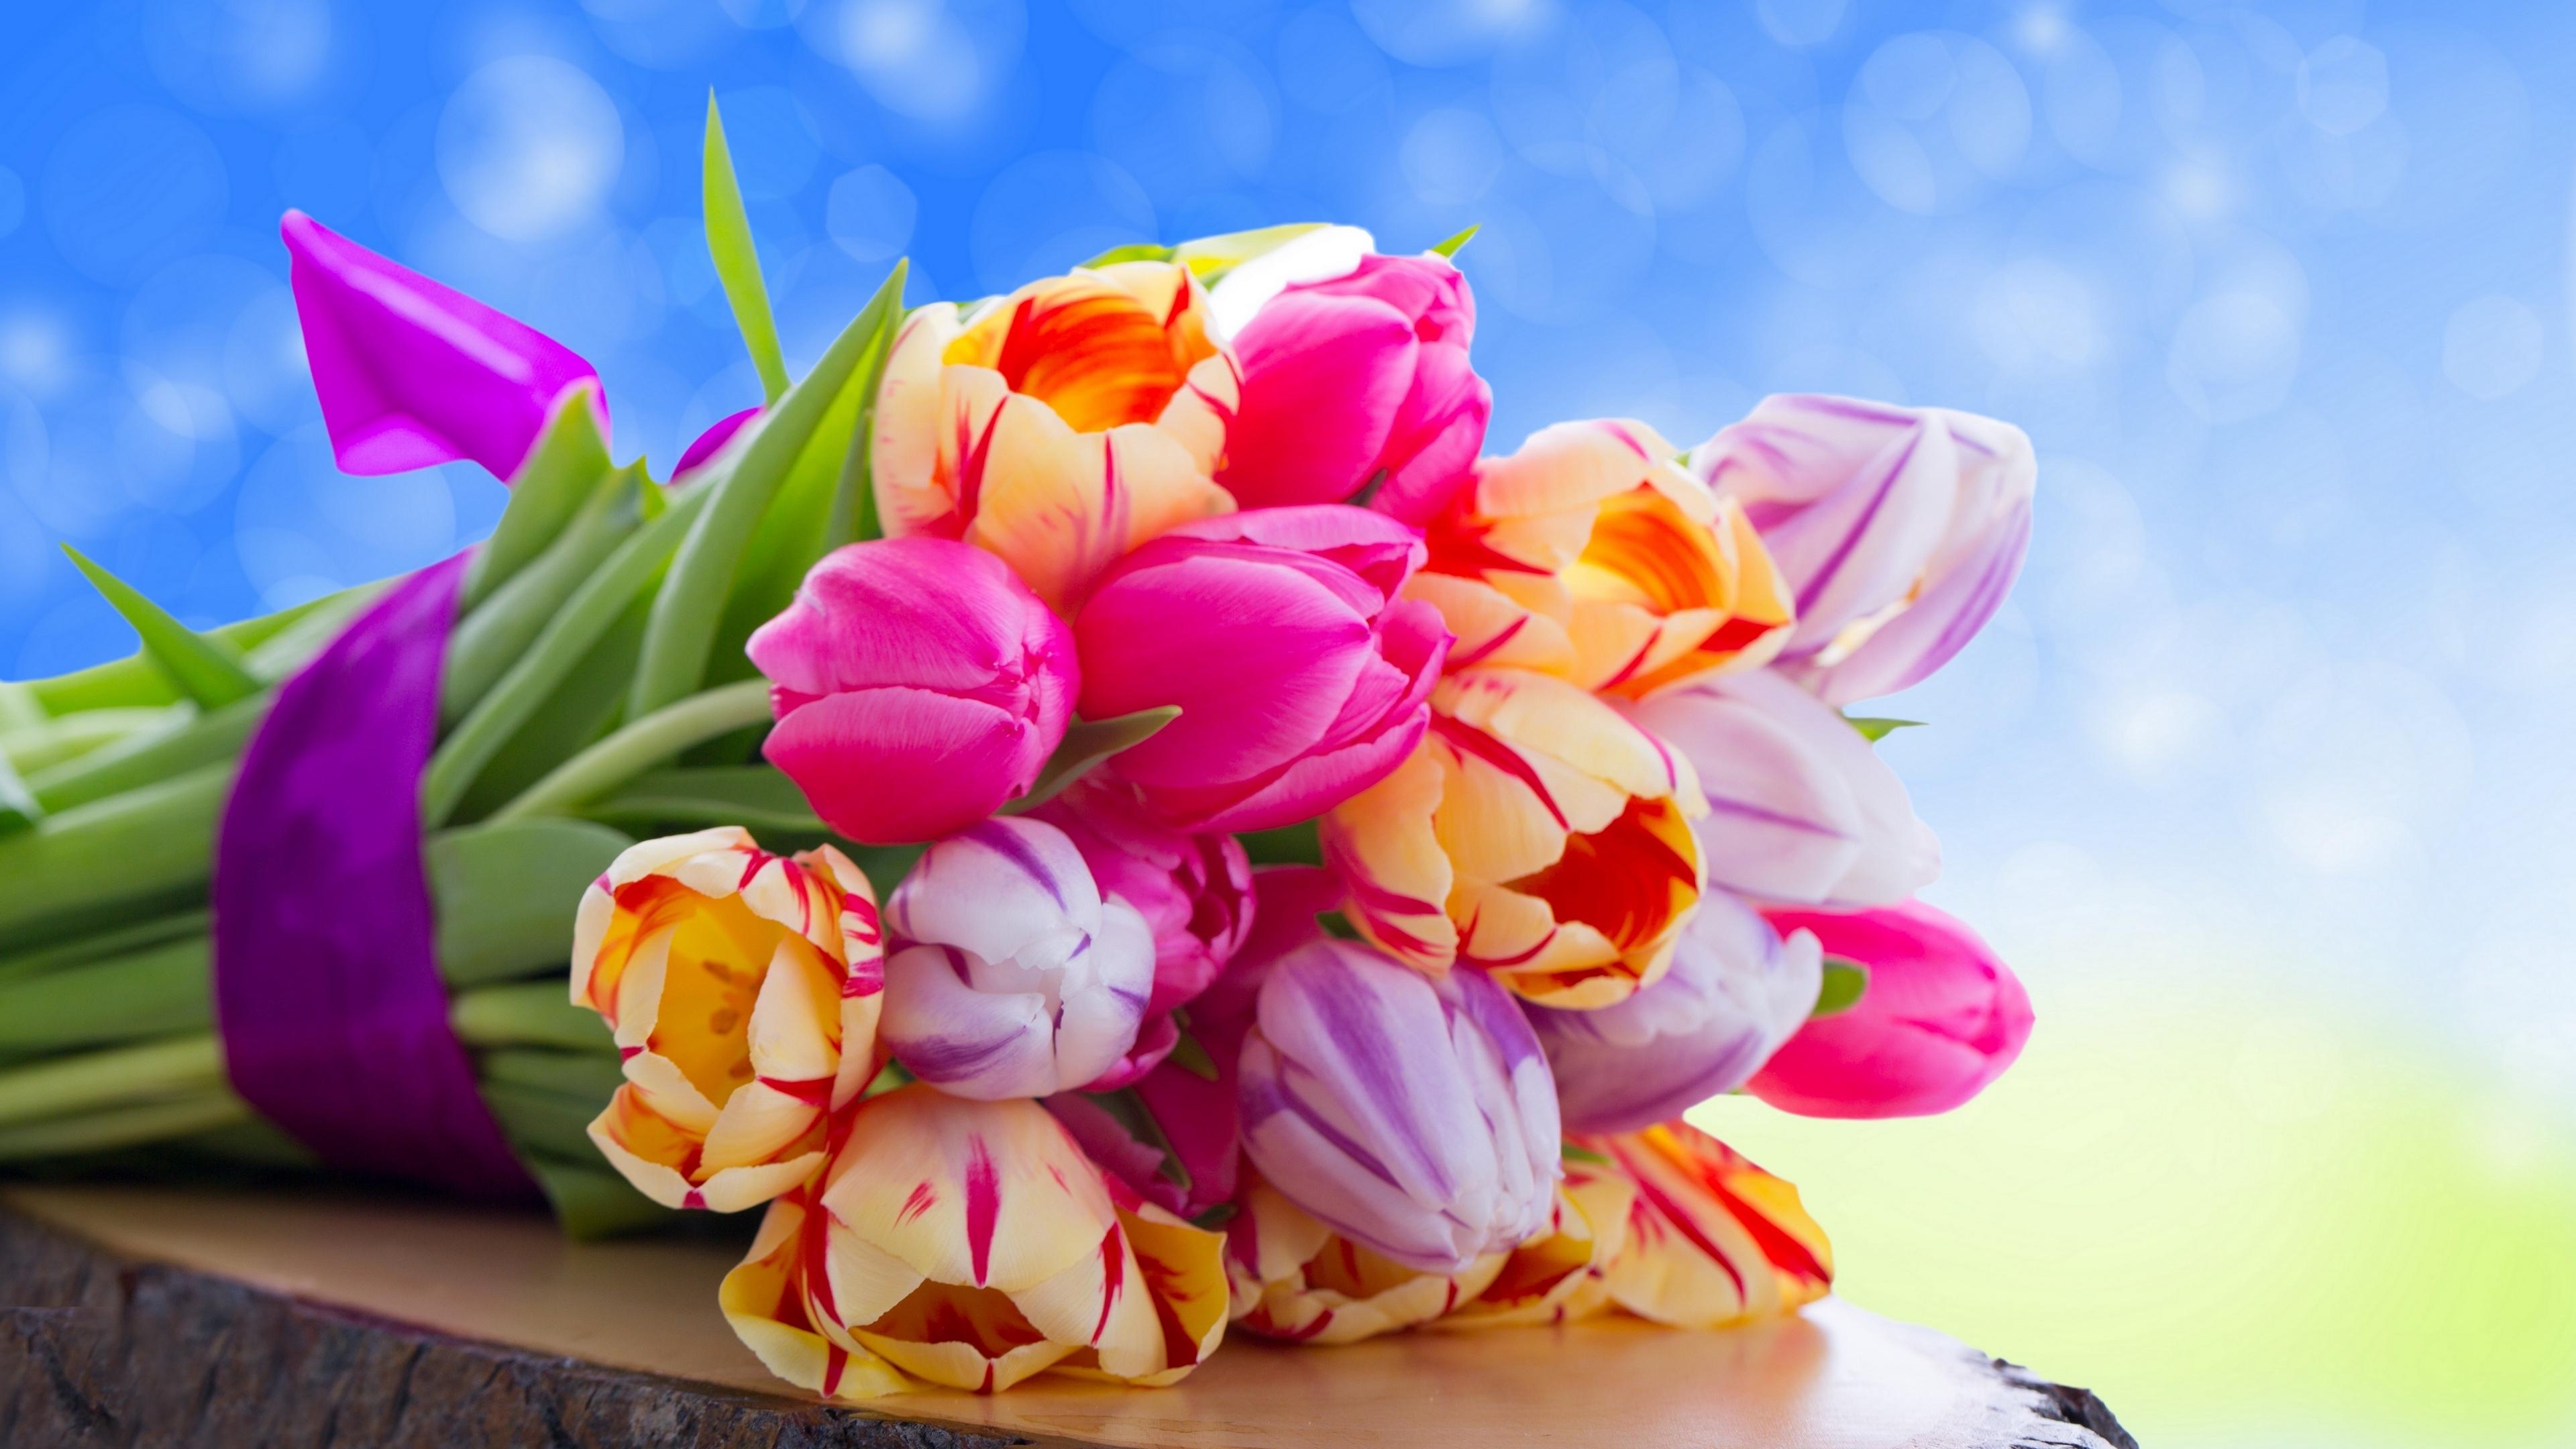 tulips flowers bouquet 4k 1540064795 - tulips, flowers, bouquet 4k - Tulips, Flowers, Bouquet